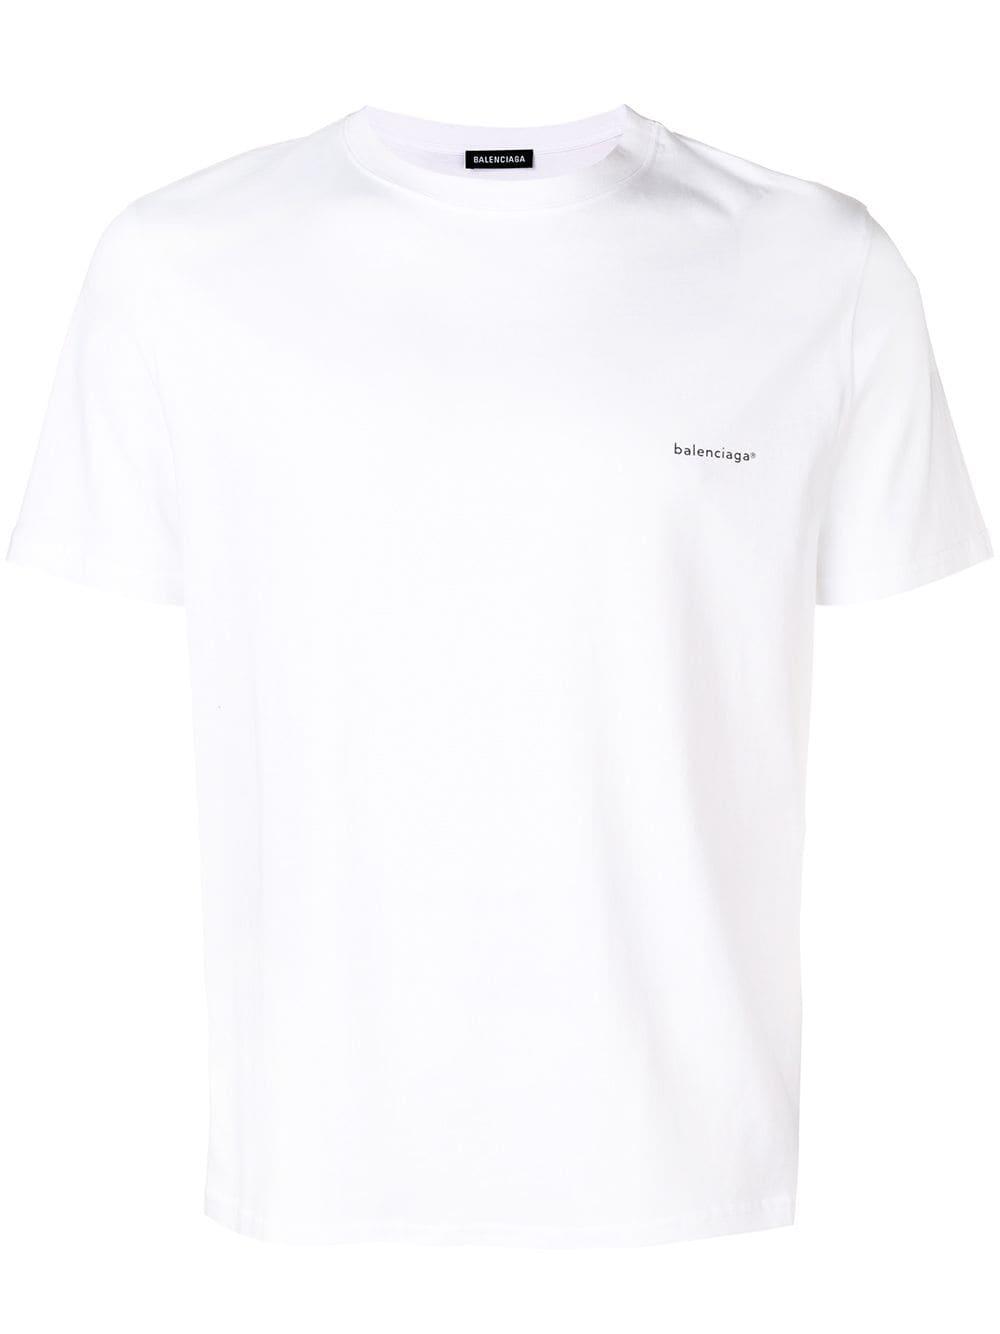 01f3b414fdfe Balenciaga logo print T-shirt - White in 2019 | Products ...